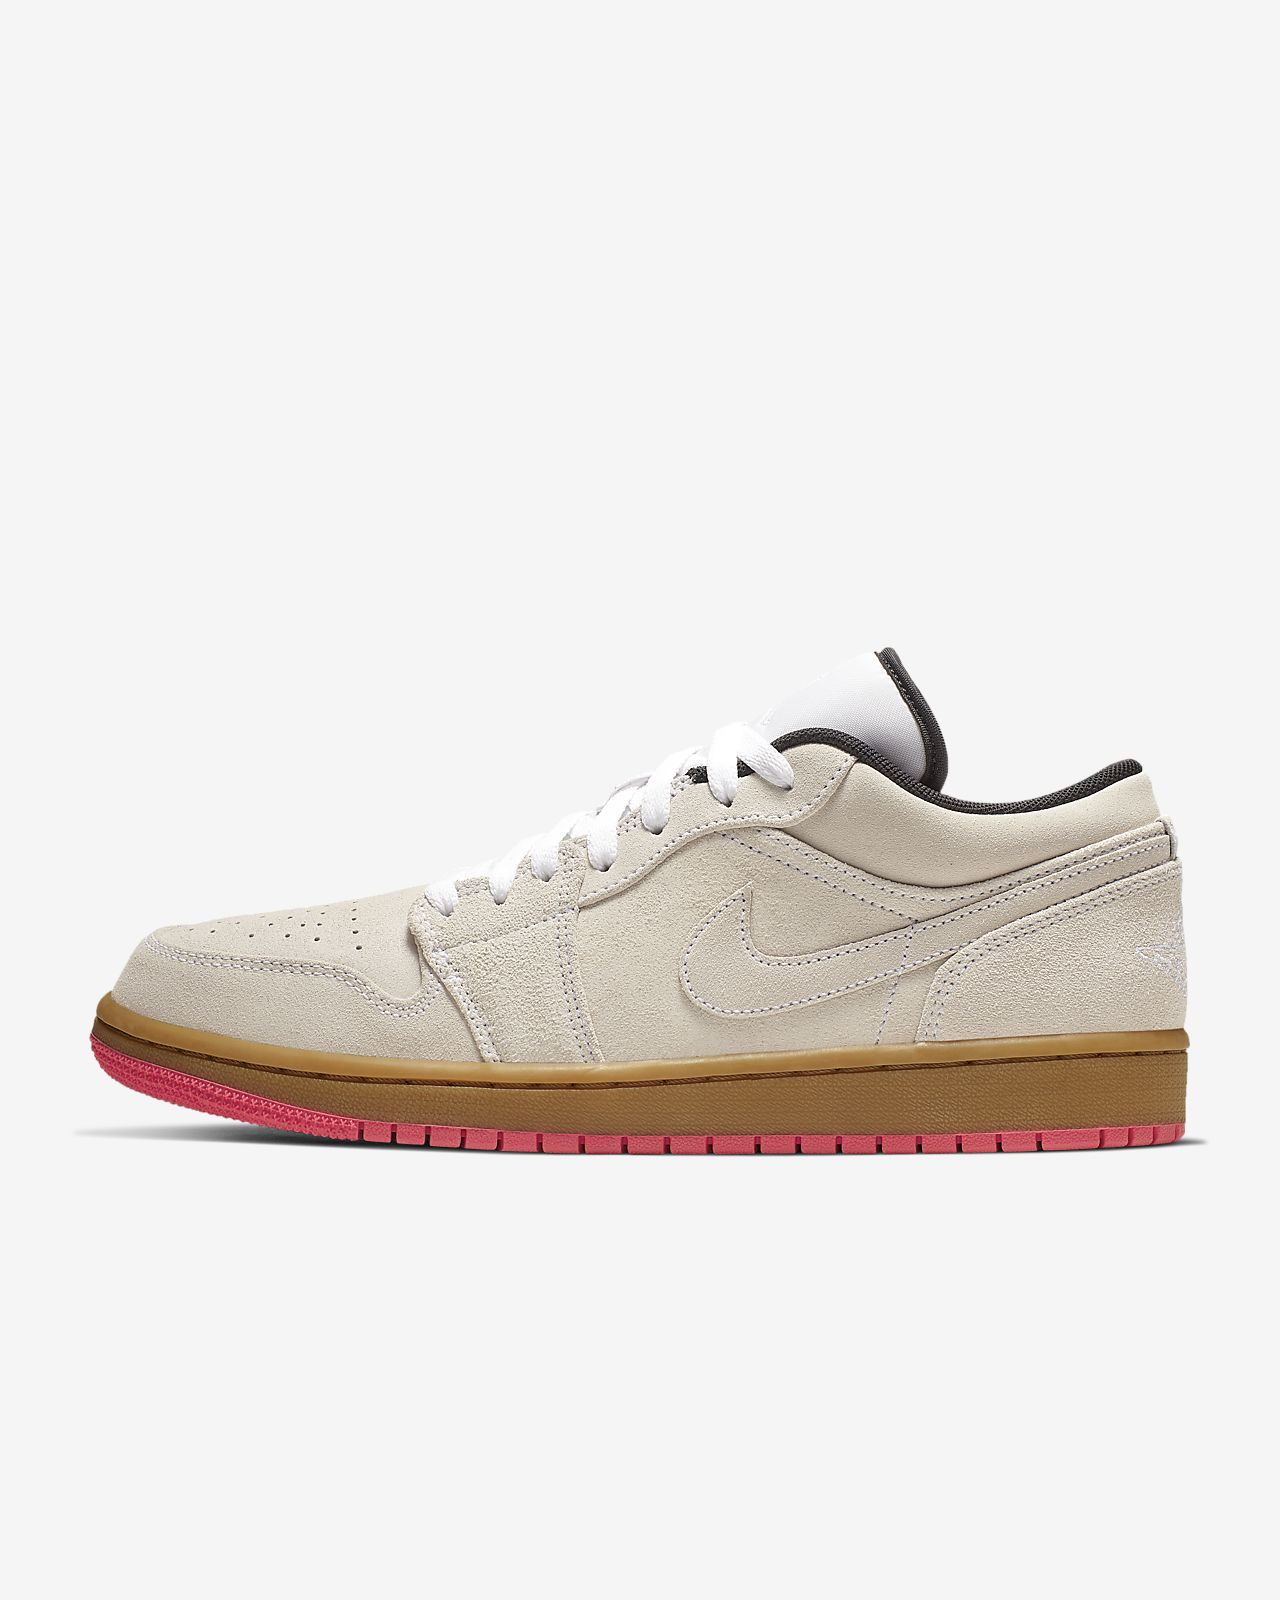 ff3d7f4f774b78 Air Jordan 1 Low Men s Shoe. Nike.com CA